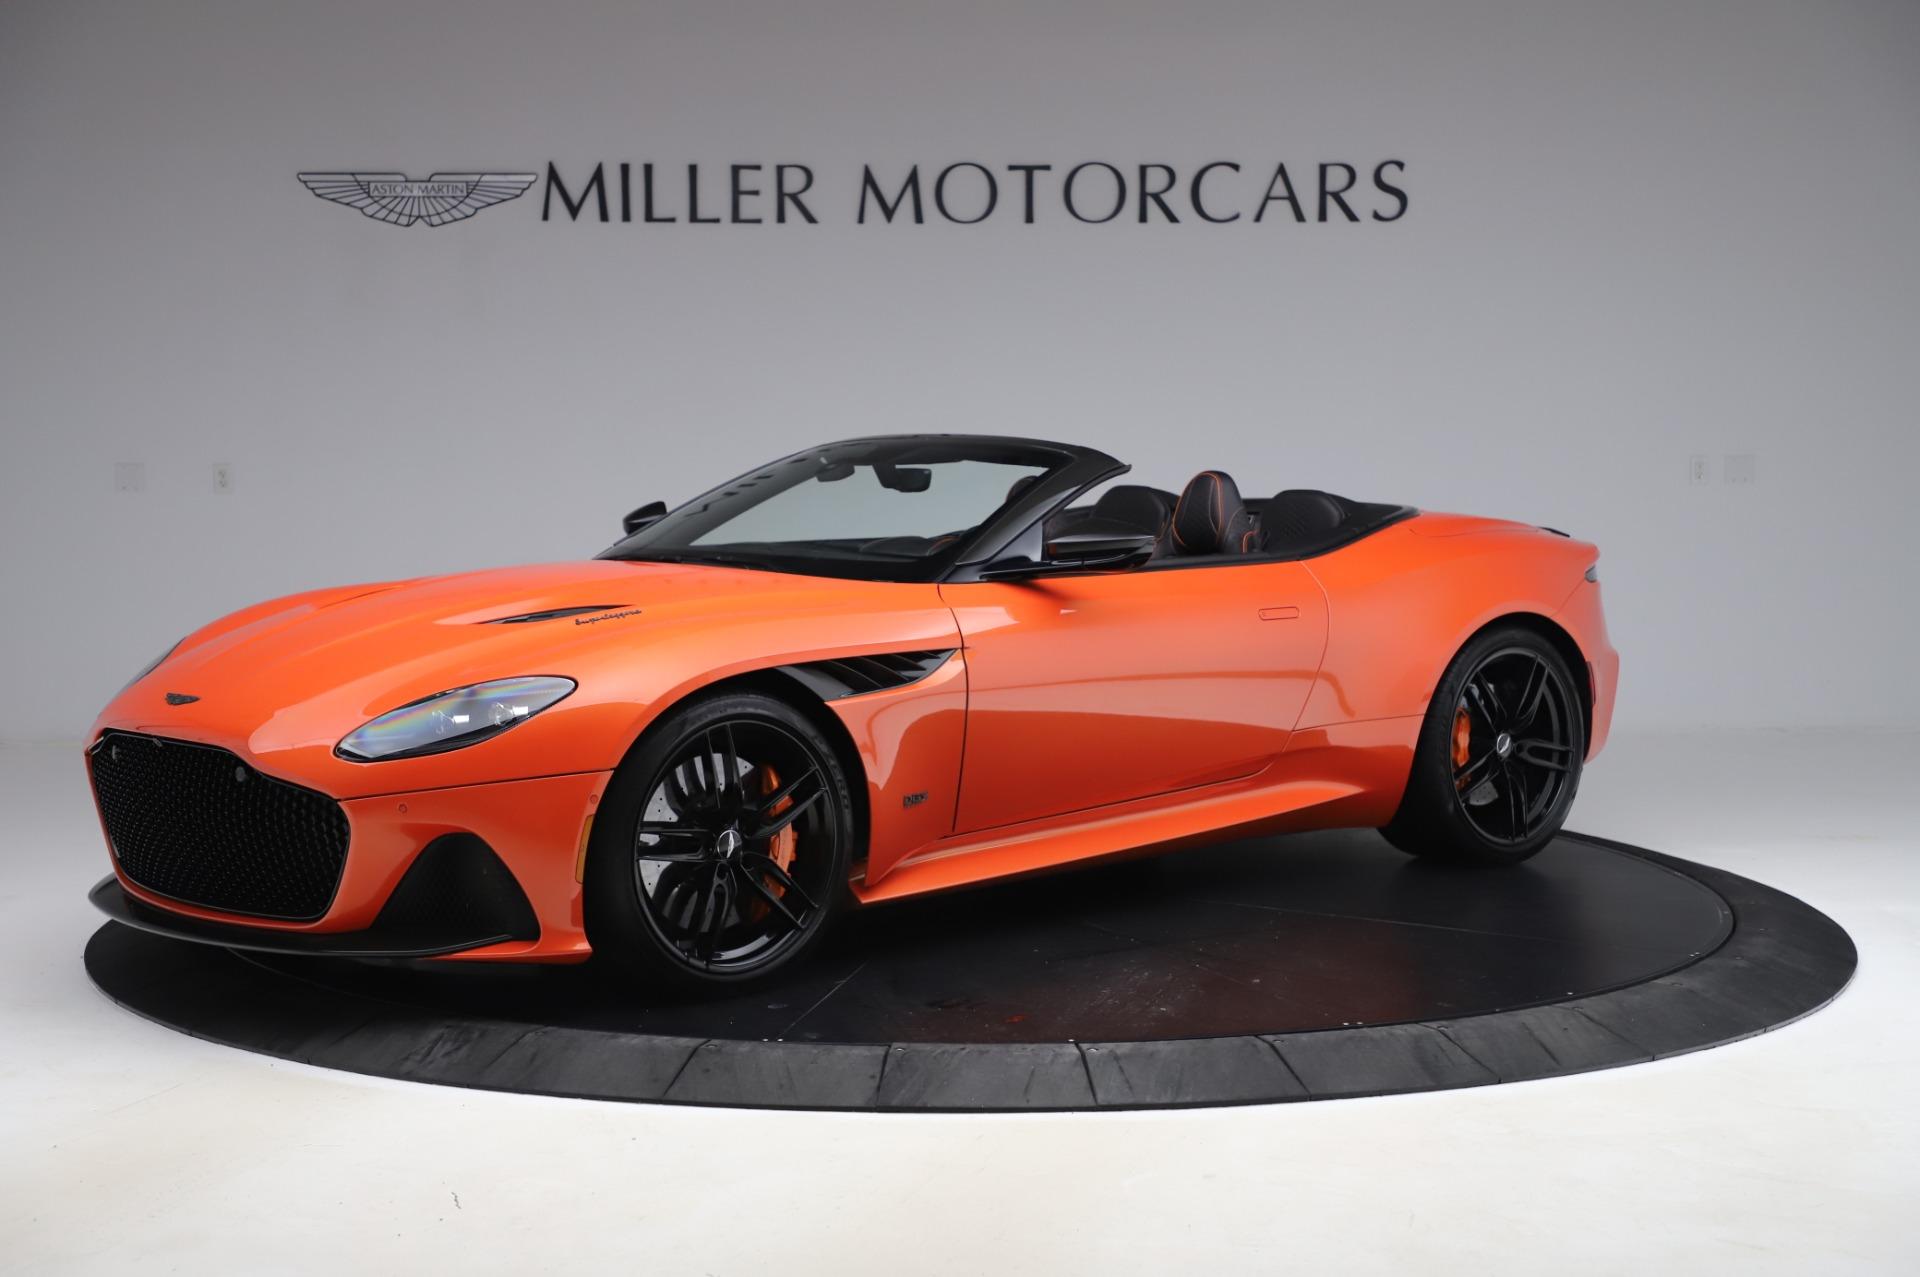 Used 2020 Aston Martin DBS Superleggera Volante for sale $339,800 at Rolls-Royce Motor Cars Greenwich in Greenwich CT 06830 1